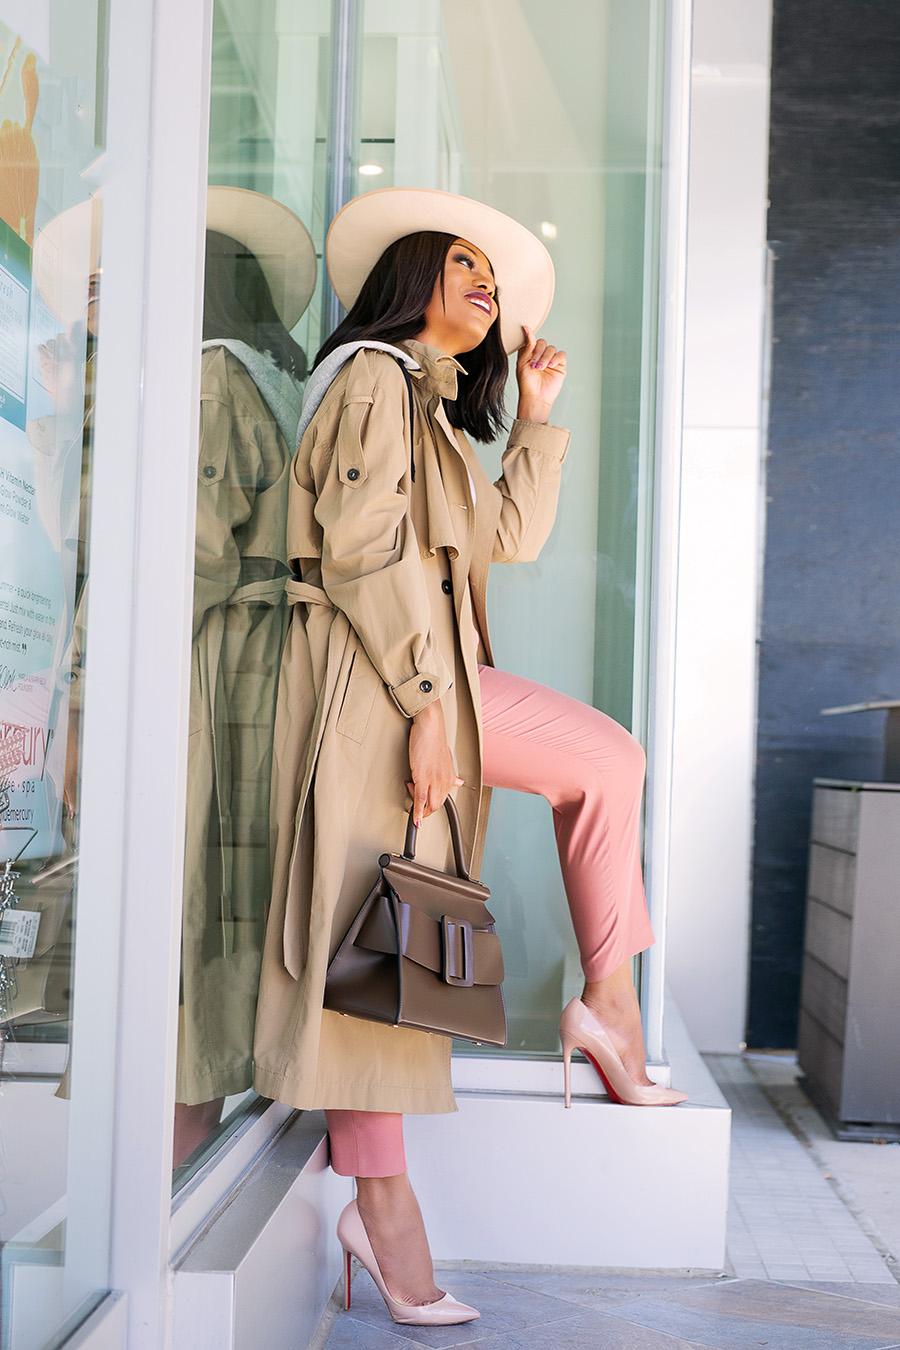 stella-adewunmi-of-jadore-fashion-shares-trench-coat-boyy-bag